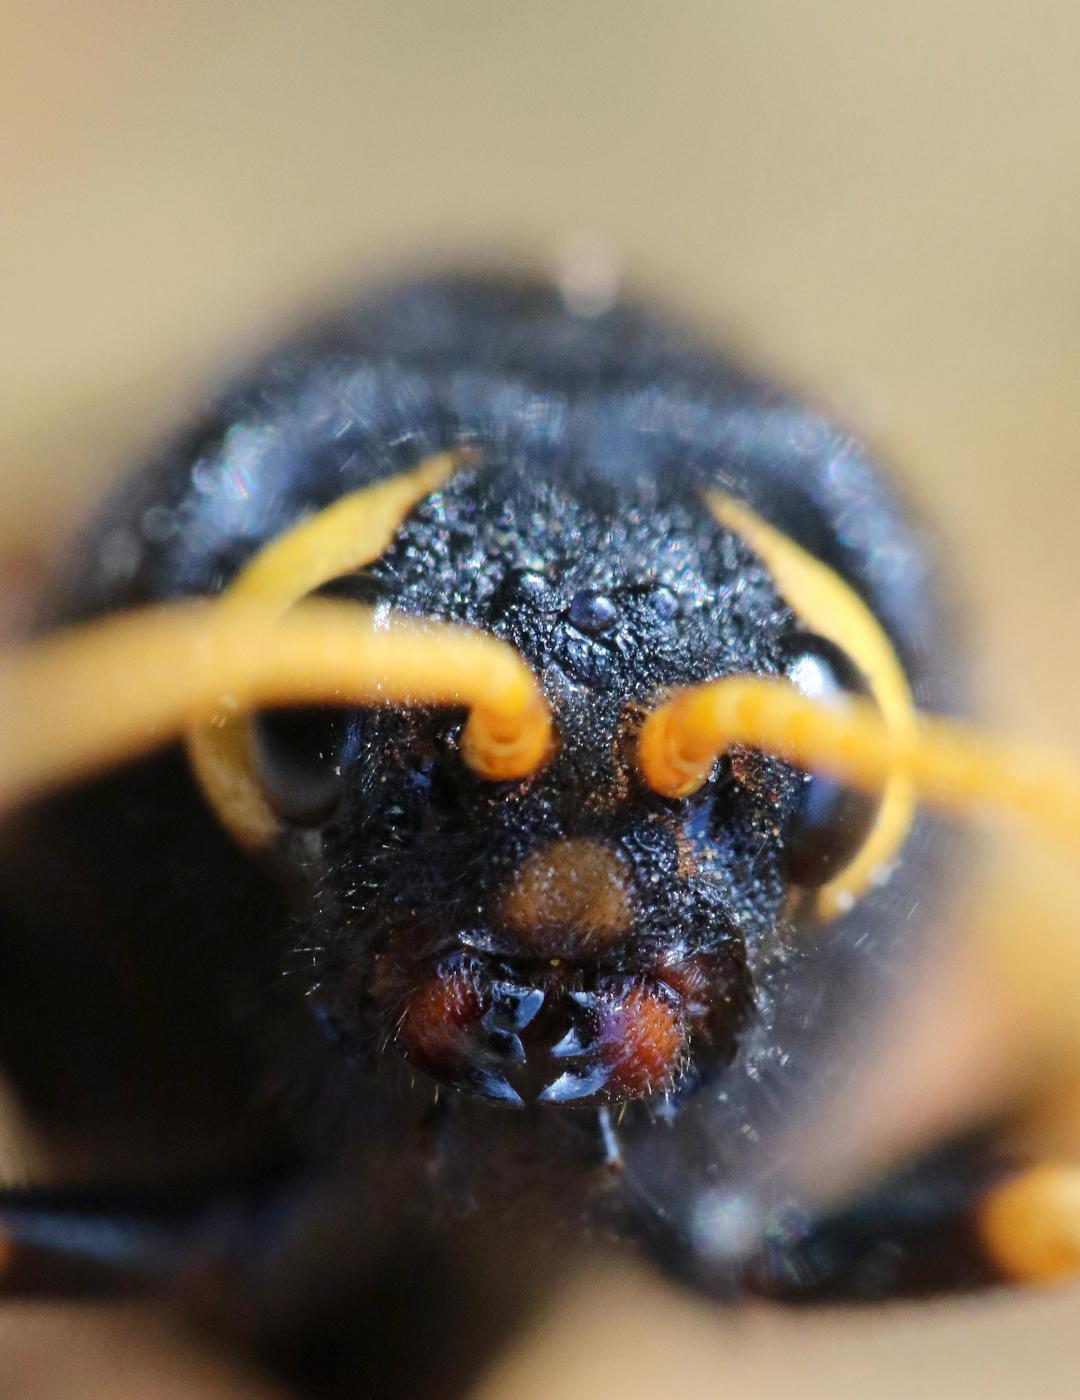 Urocerus gigas femelle face